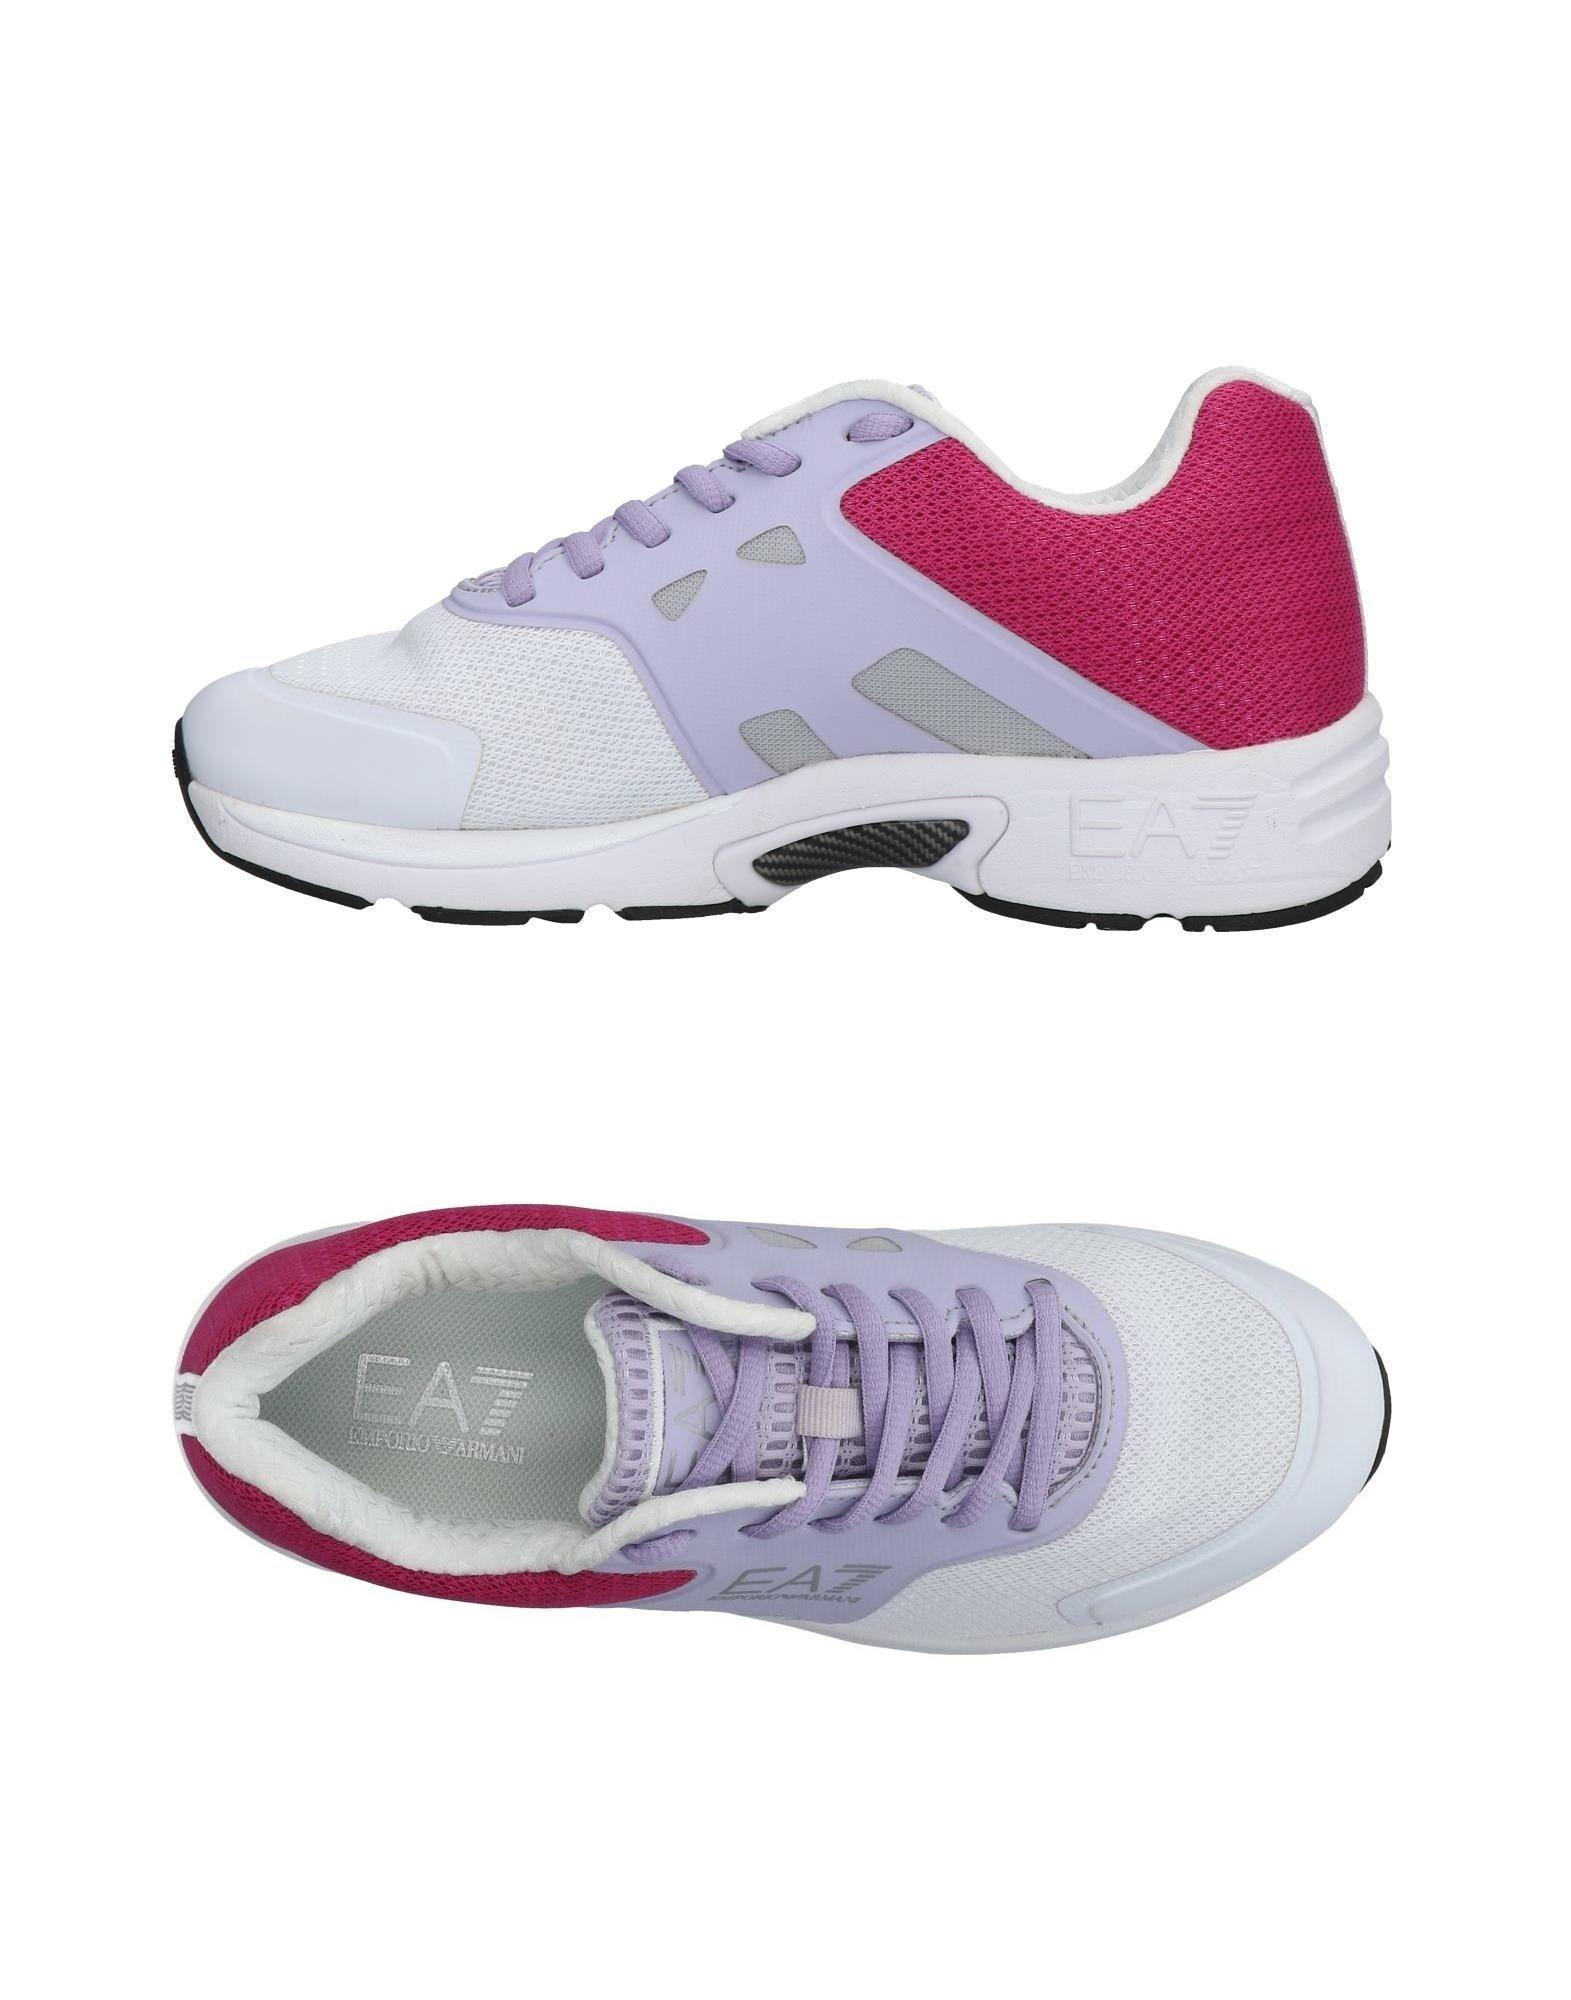 Heiße Ea7 Sneakers Herren  11430110XK Heiße  Schuhe 03a54a